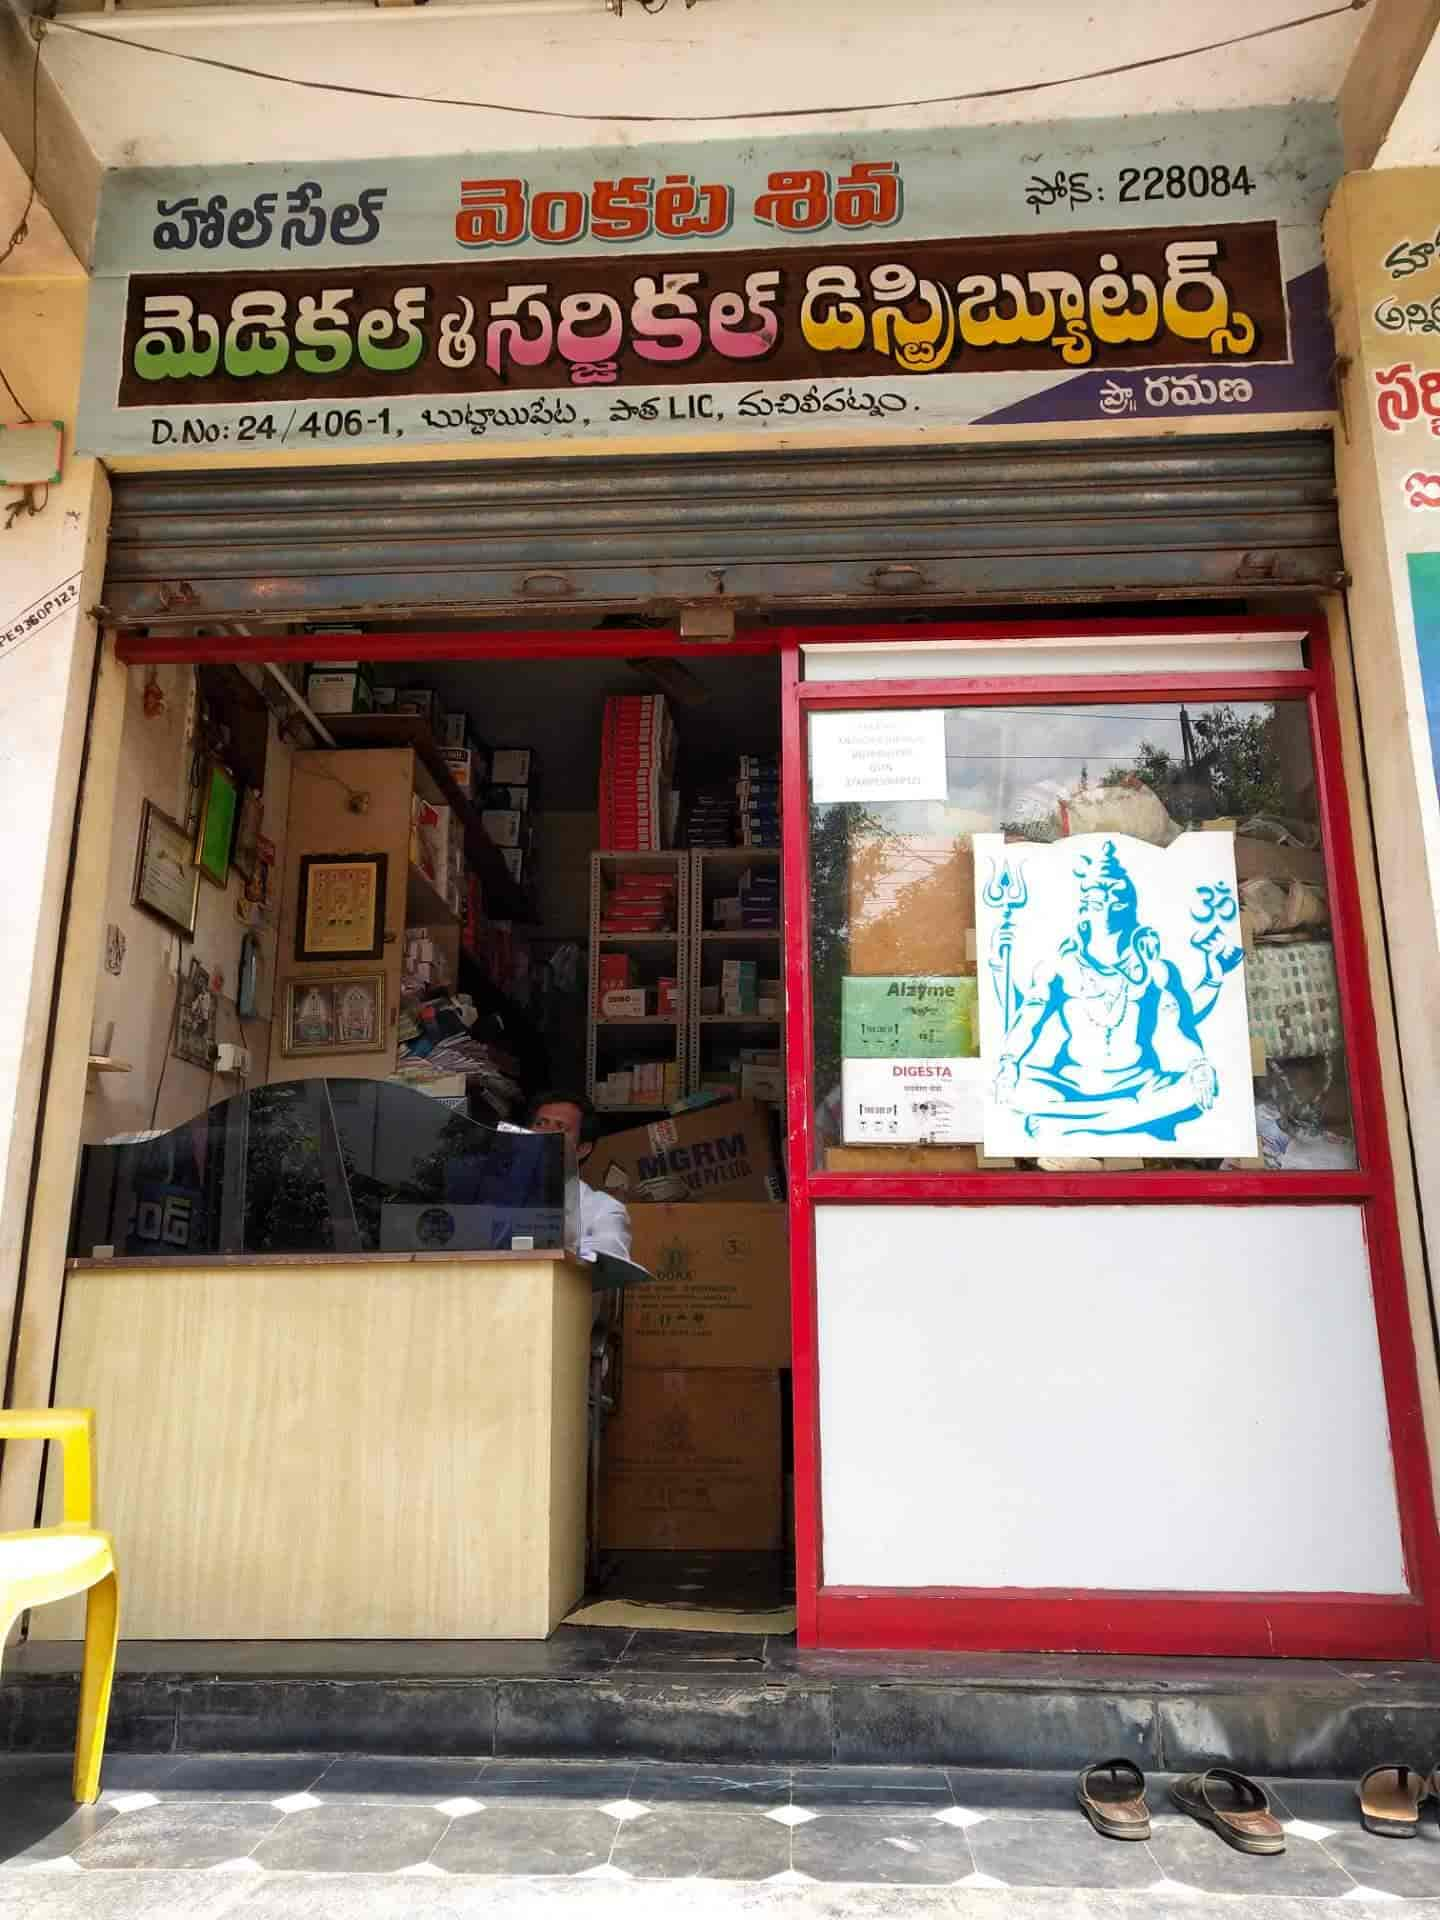 Venkata Siva Medical And Surgical Distributor Photos, Buttaipet